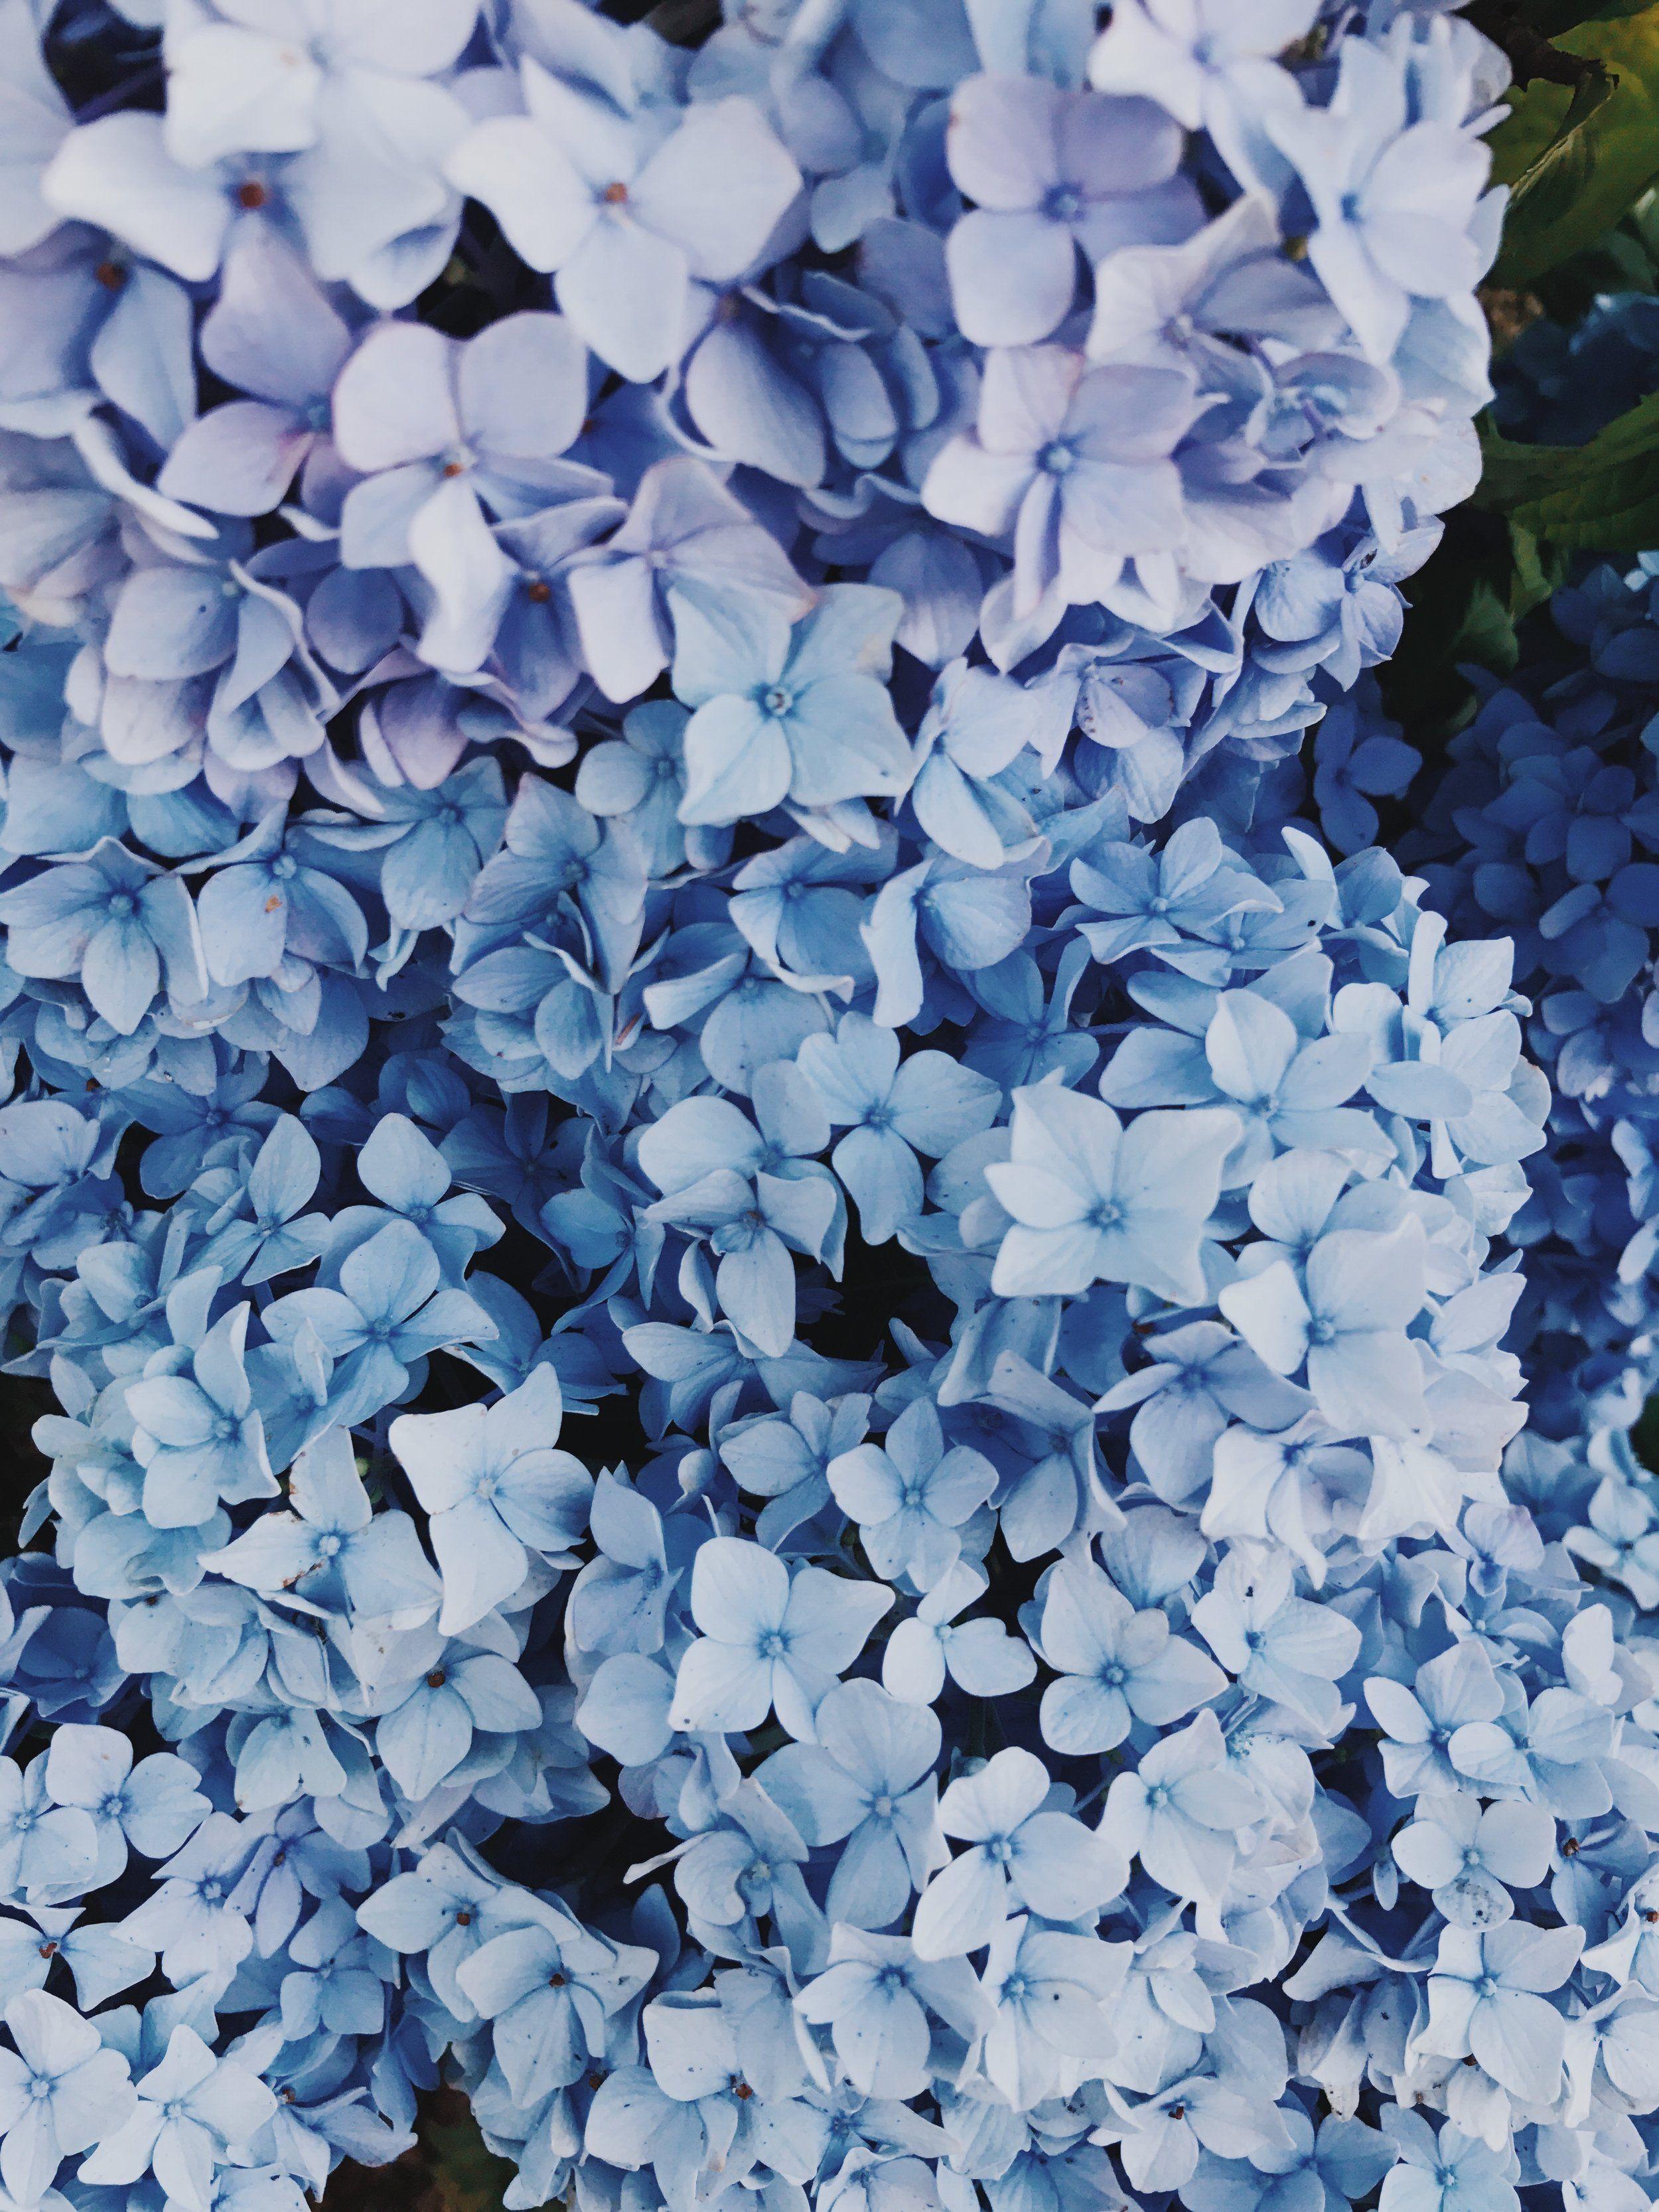 Stop And Smell The Hydrangeas Dhcblue Via Cornishbluebelle Light Blue Flowers Blue Aesthetic Pastel Light Blue Aesthetic